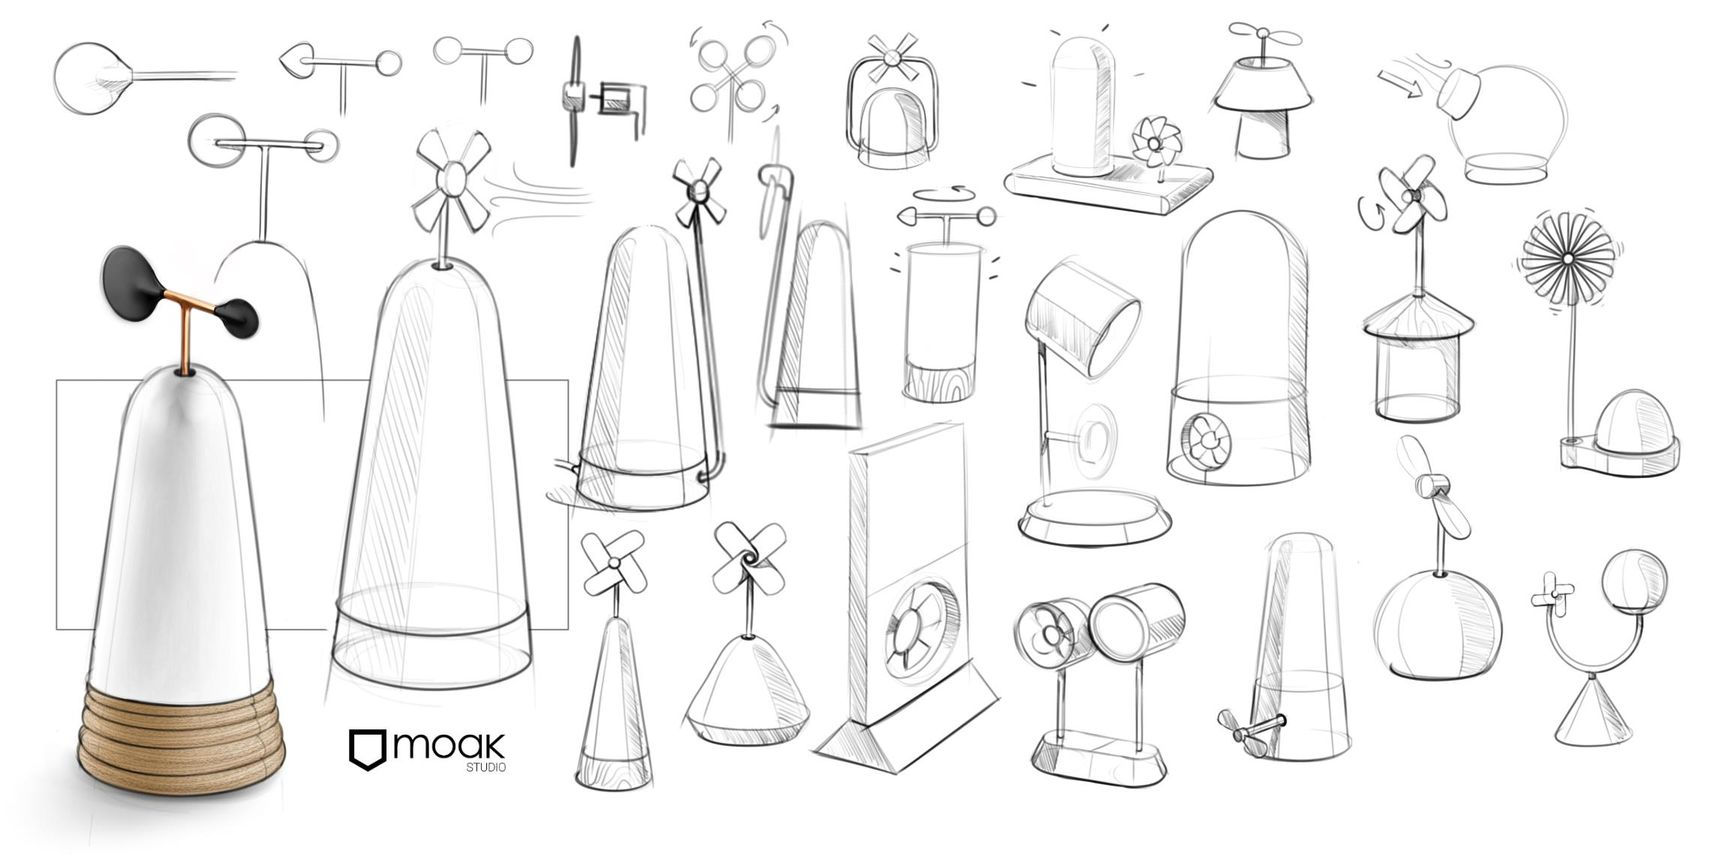 volé sketches_result.jpg